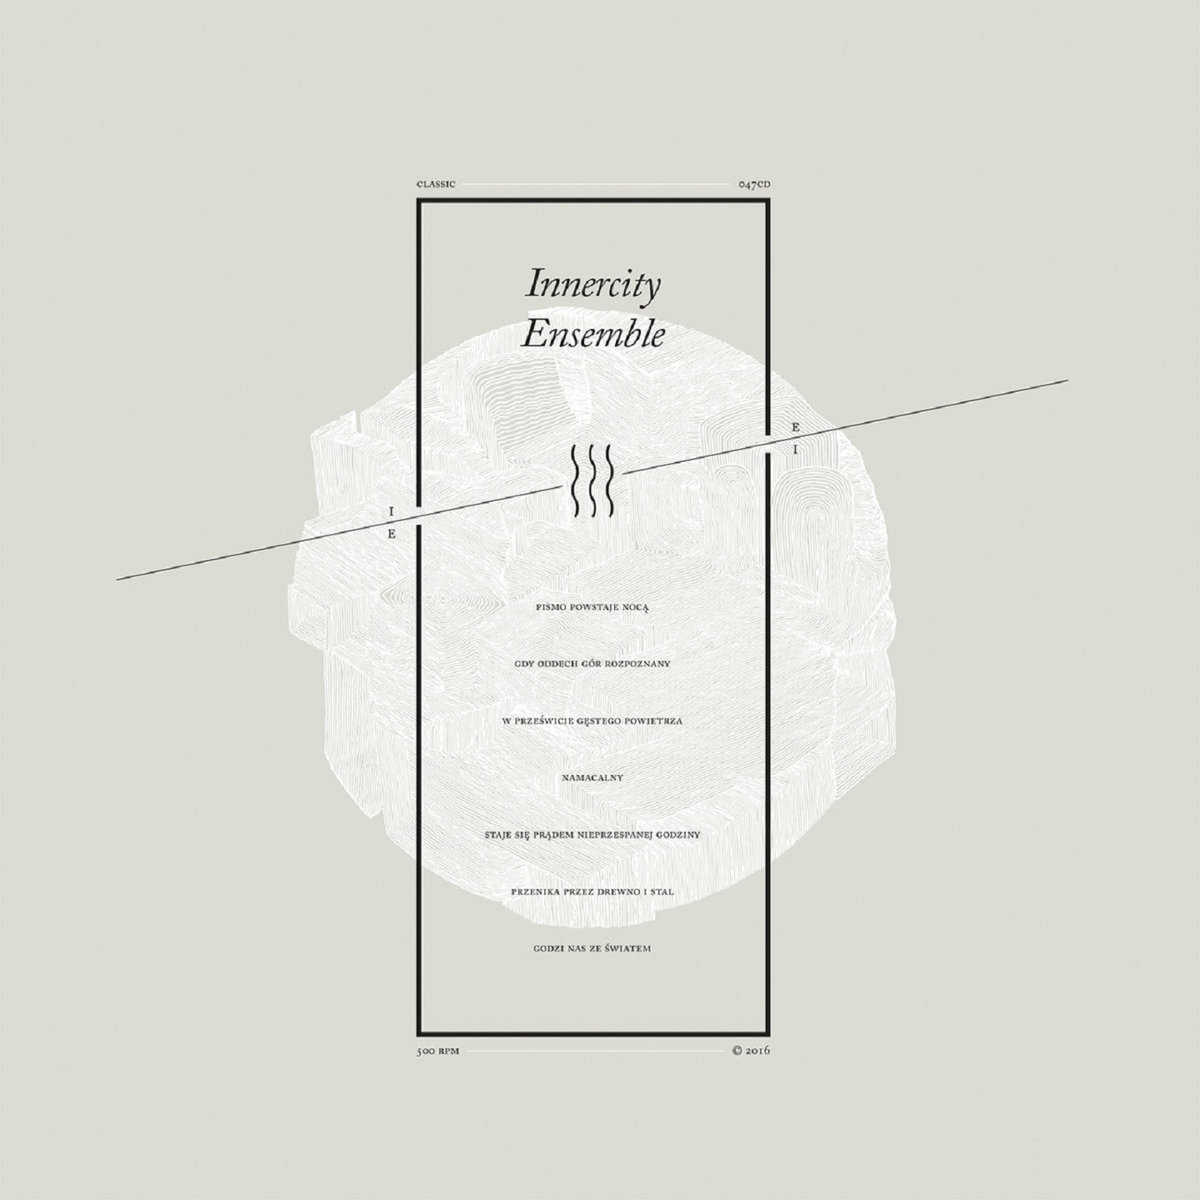 innercity-ensemble-iii